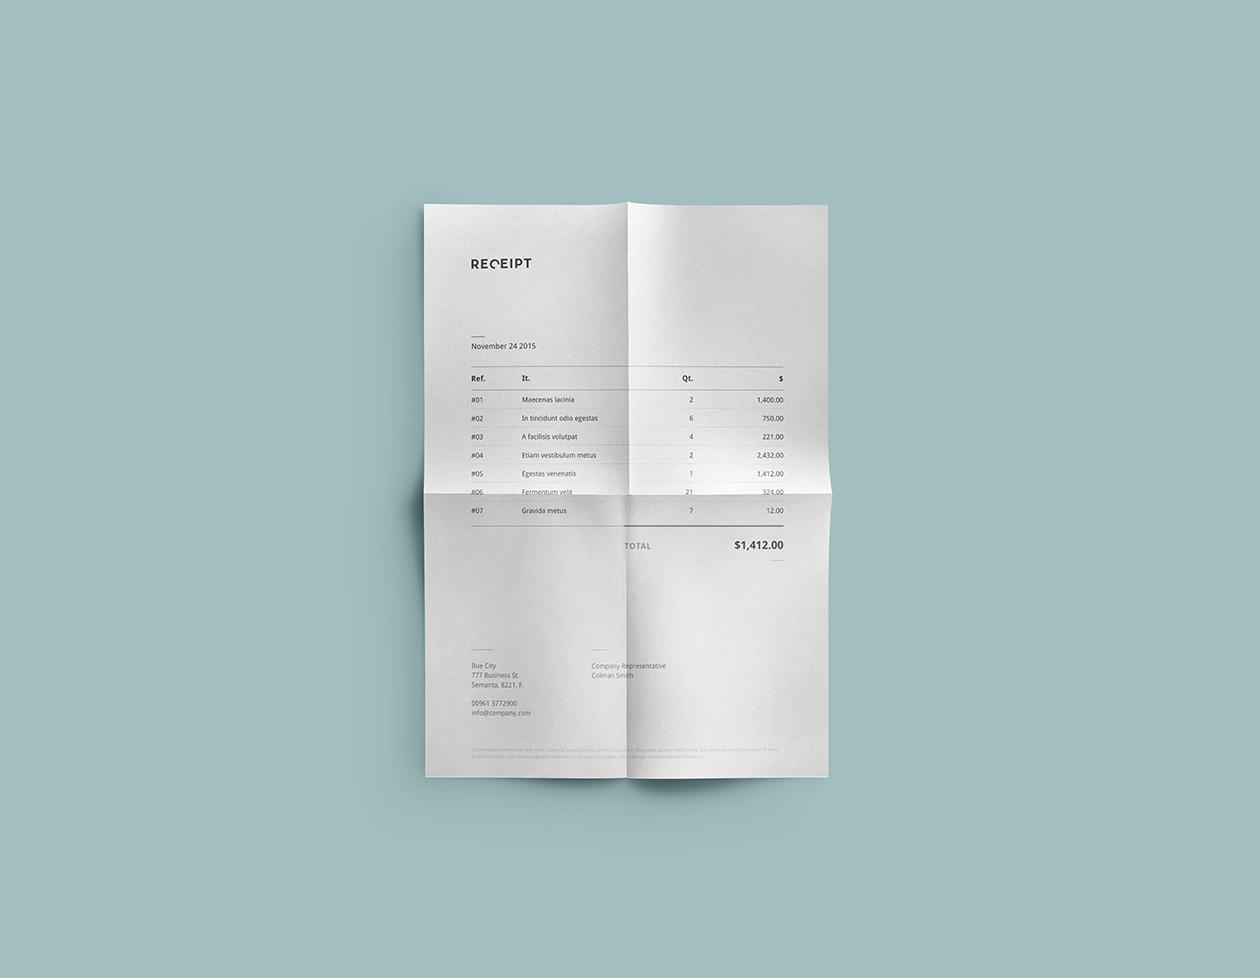 receipt template design. Black Bedroom Furniture Sets. Home Design Ideas